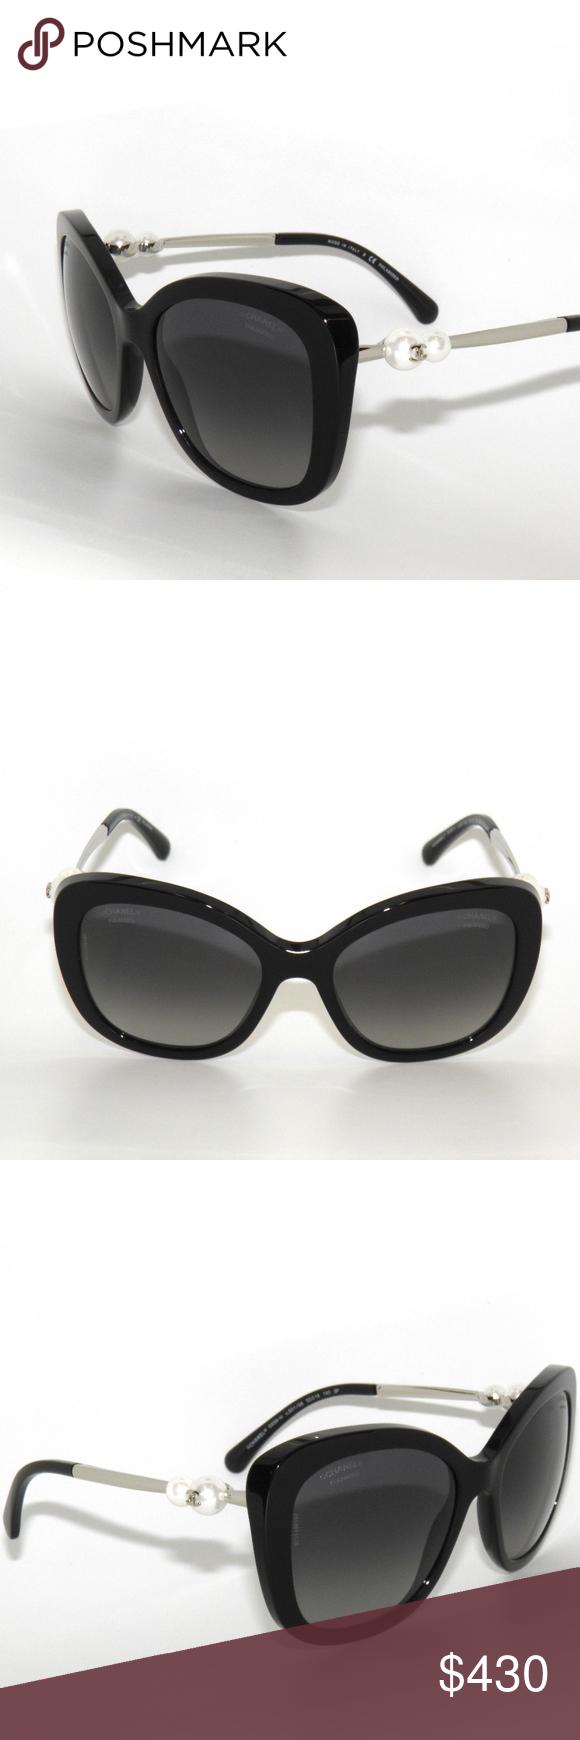 b9e66c876fc Chanel Polarized Pearl Sunglasses 5339H Authentic Chanel Brand new and  Authentic Sunglasses in Original packaging Model. poshmark.com